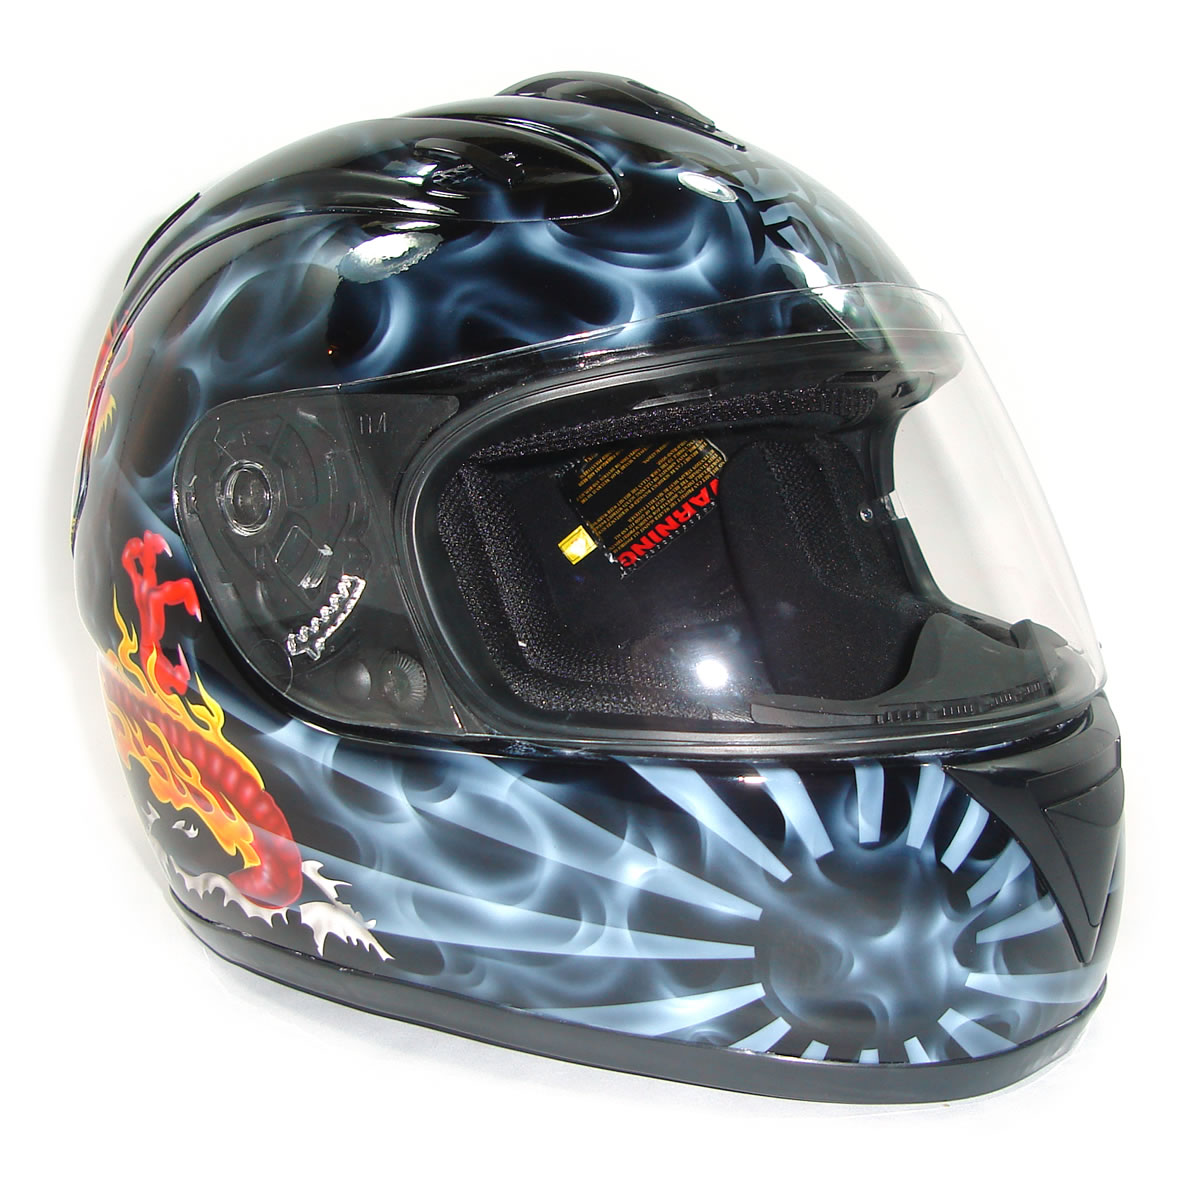 Custom Painted Helmet Gallery Japanese Samurai